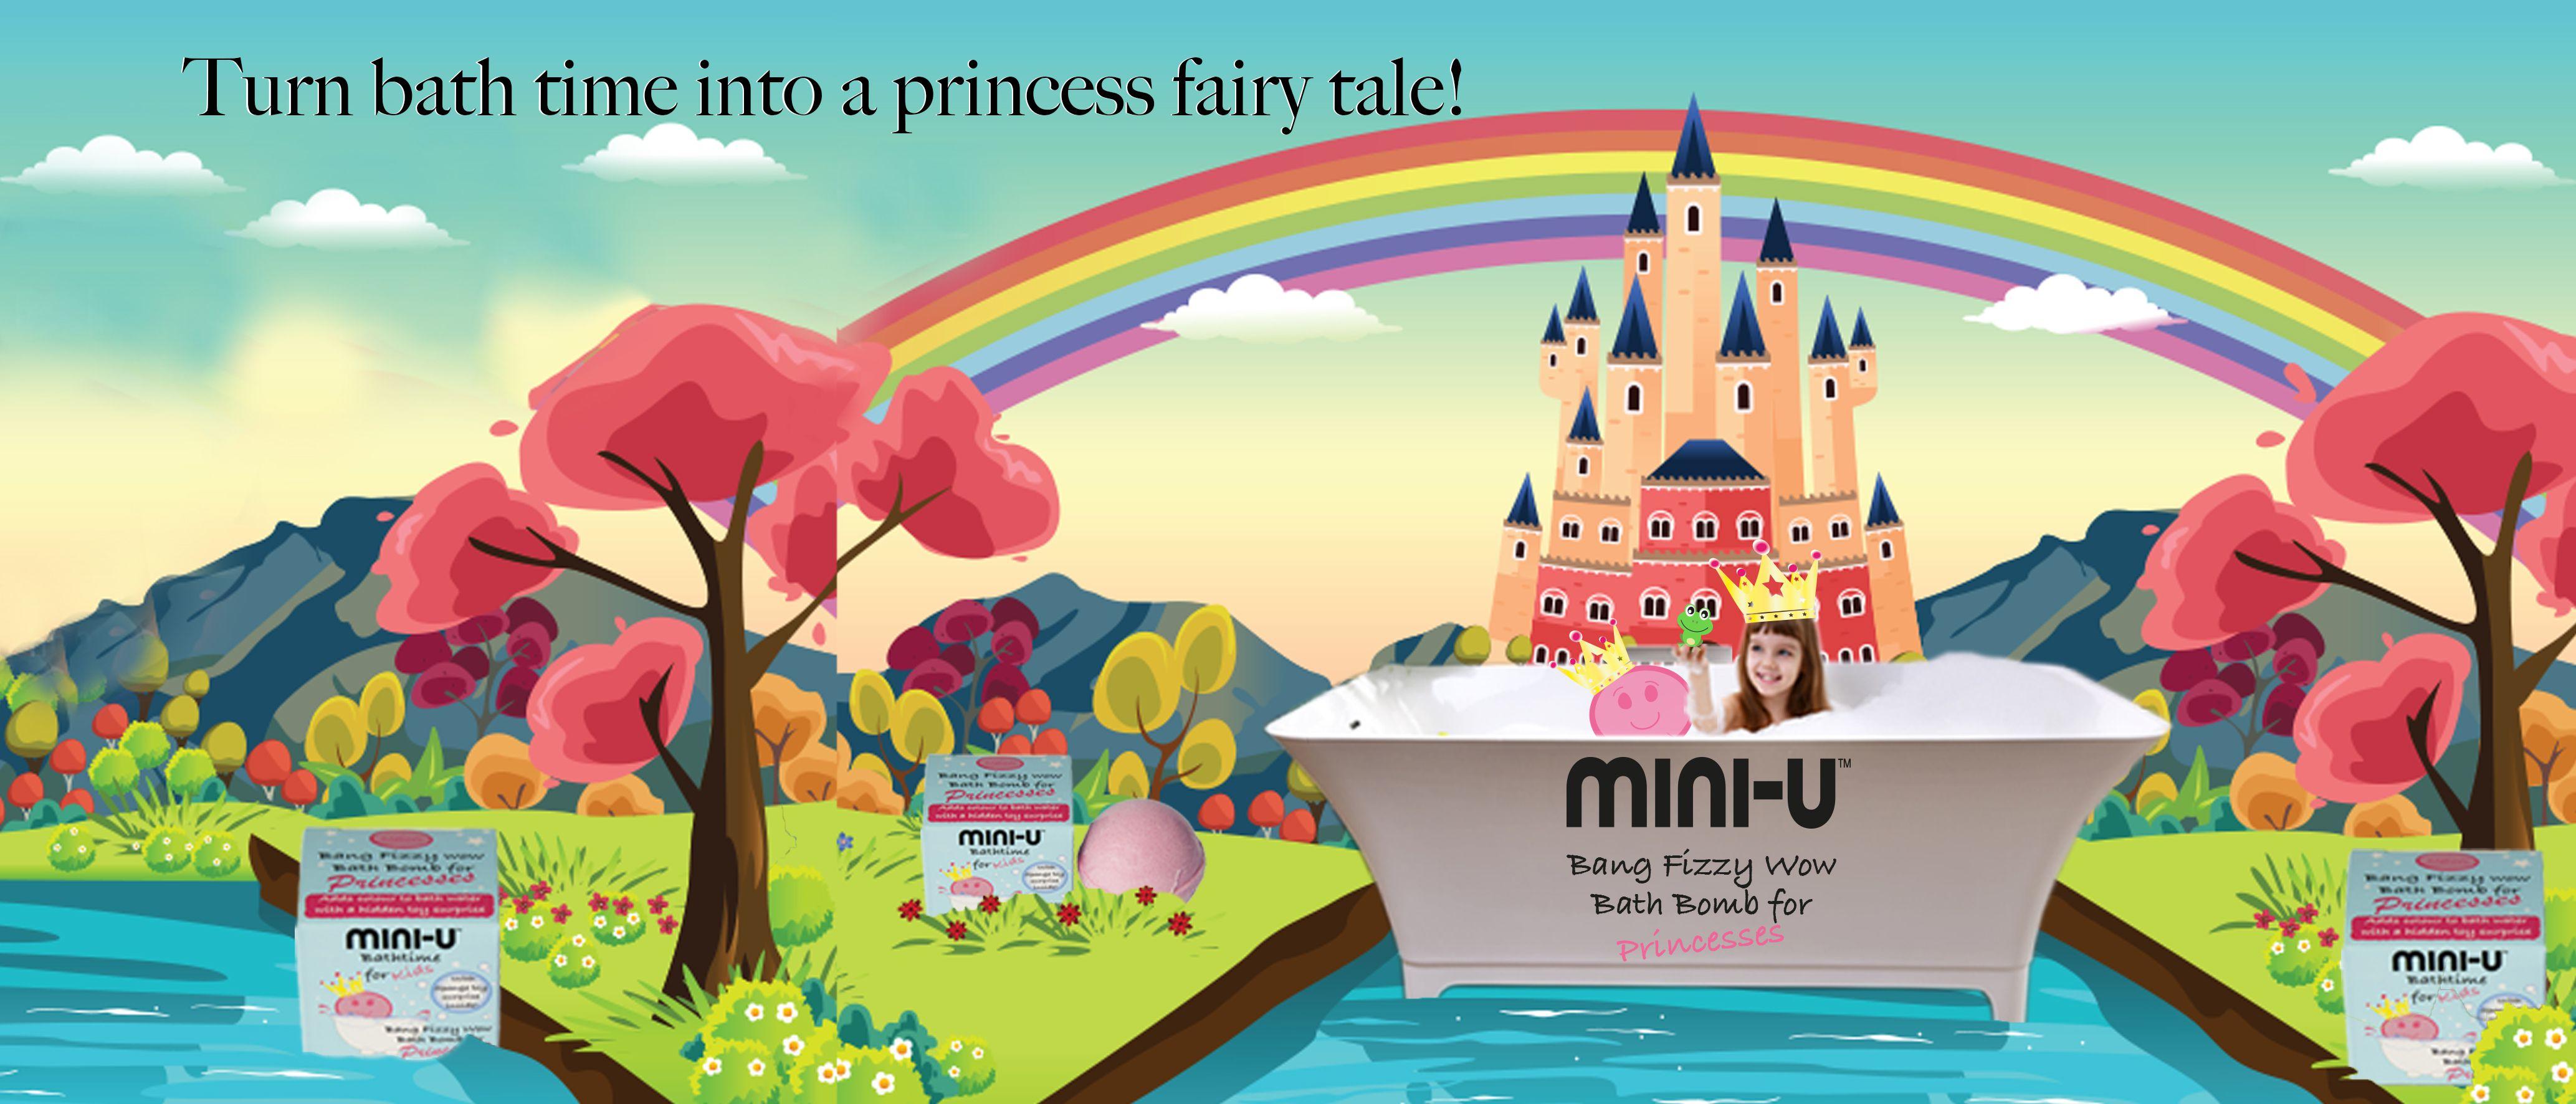 princess-imagination